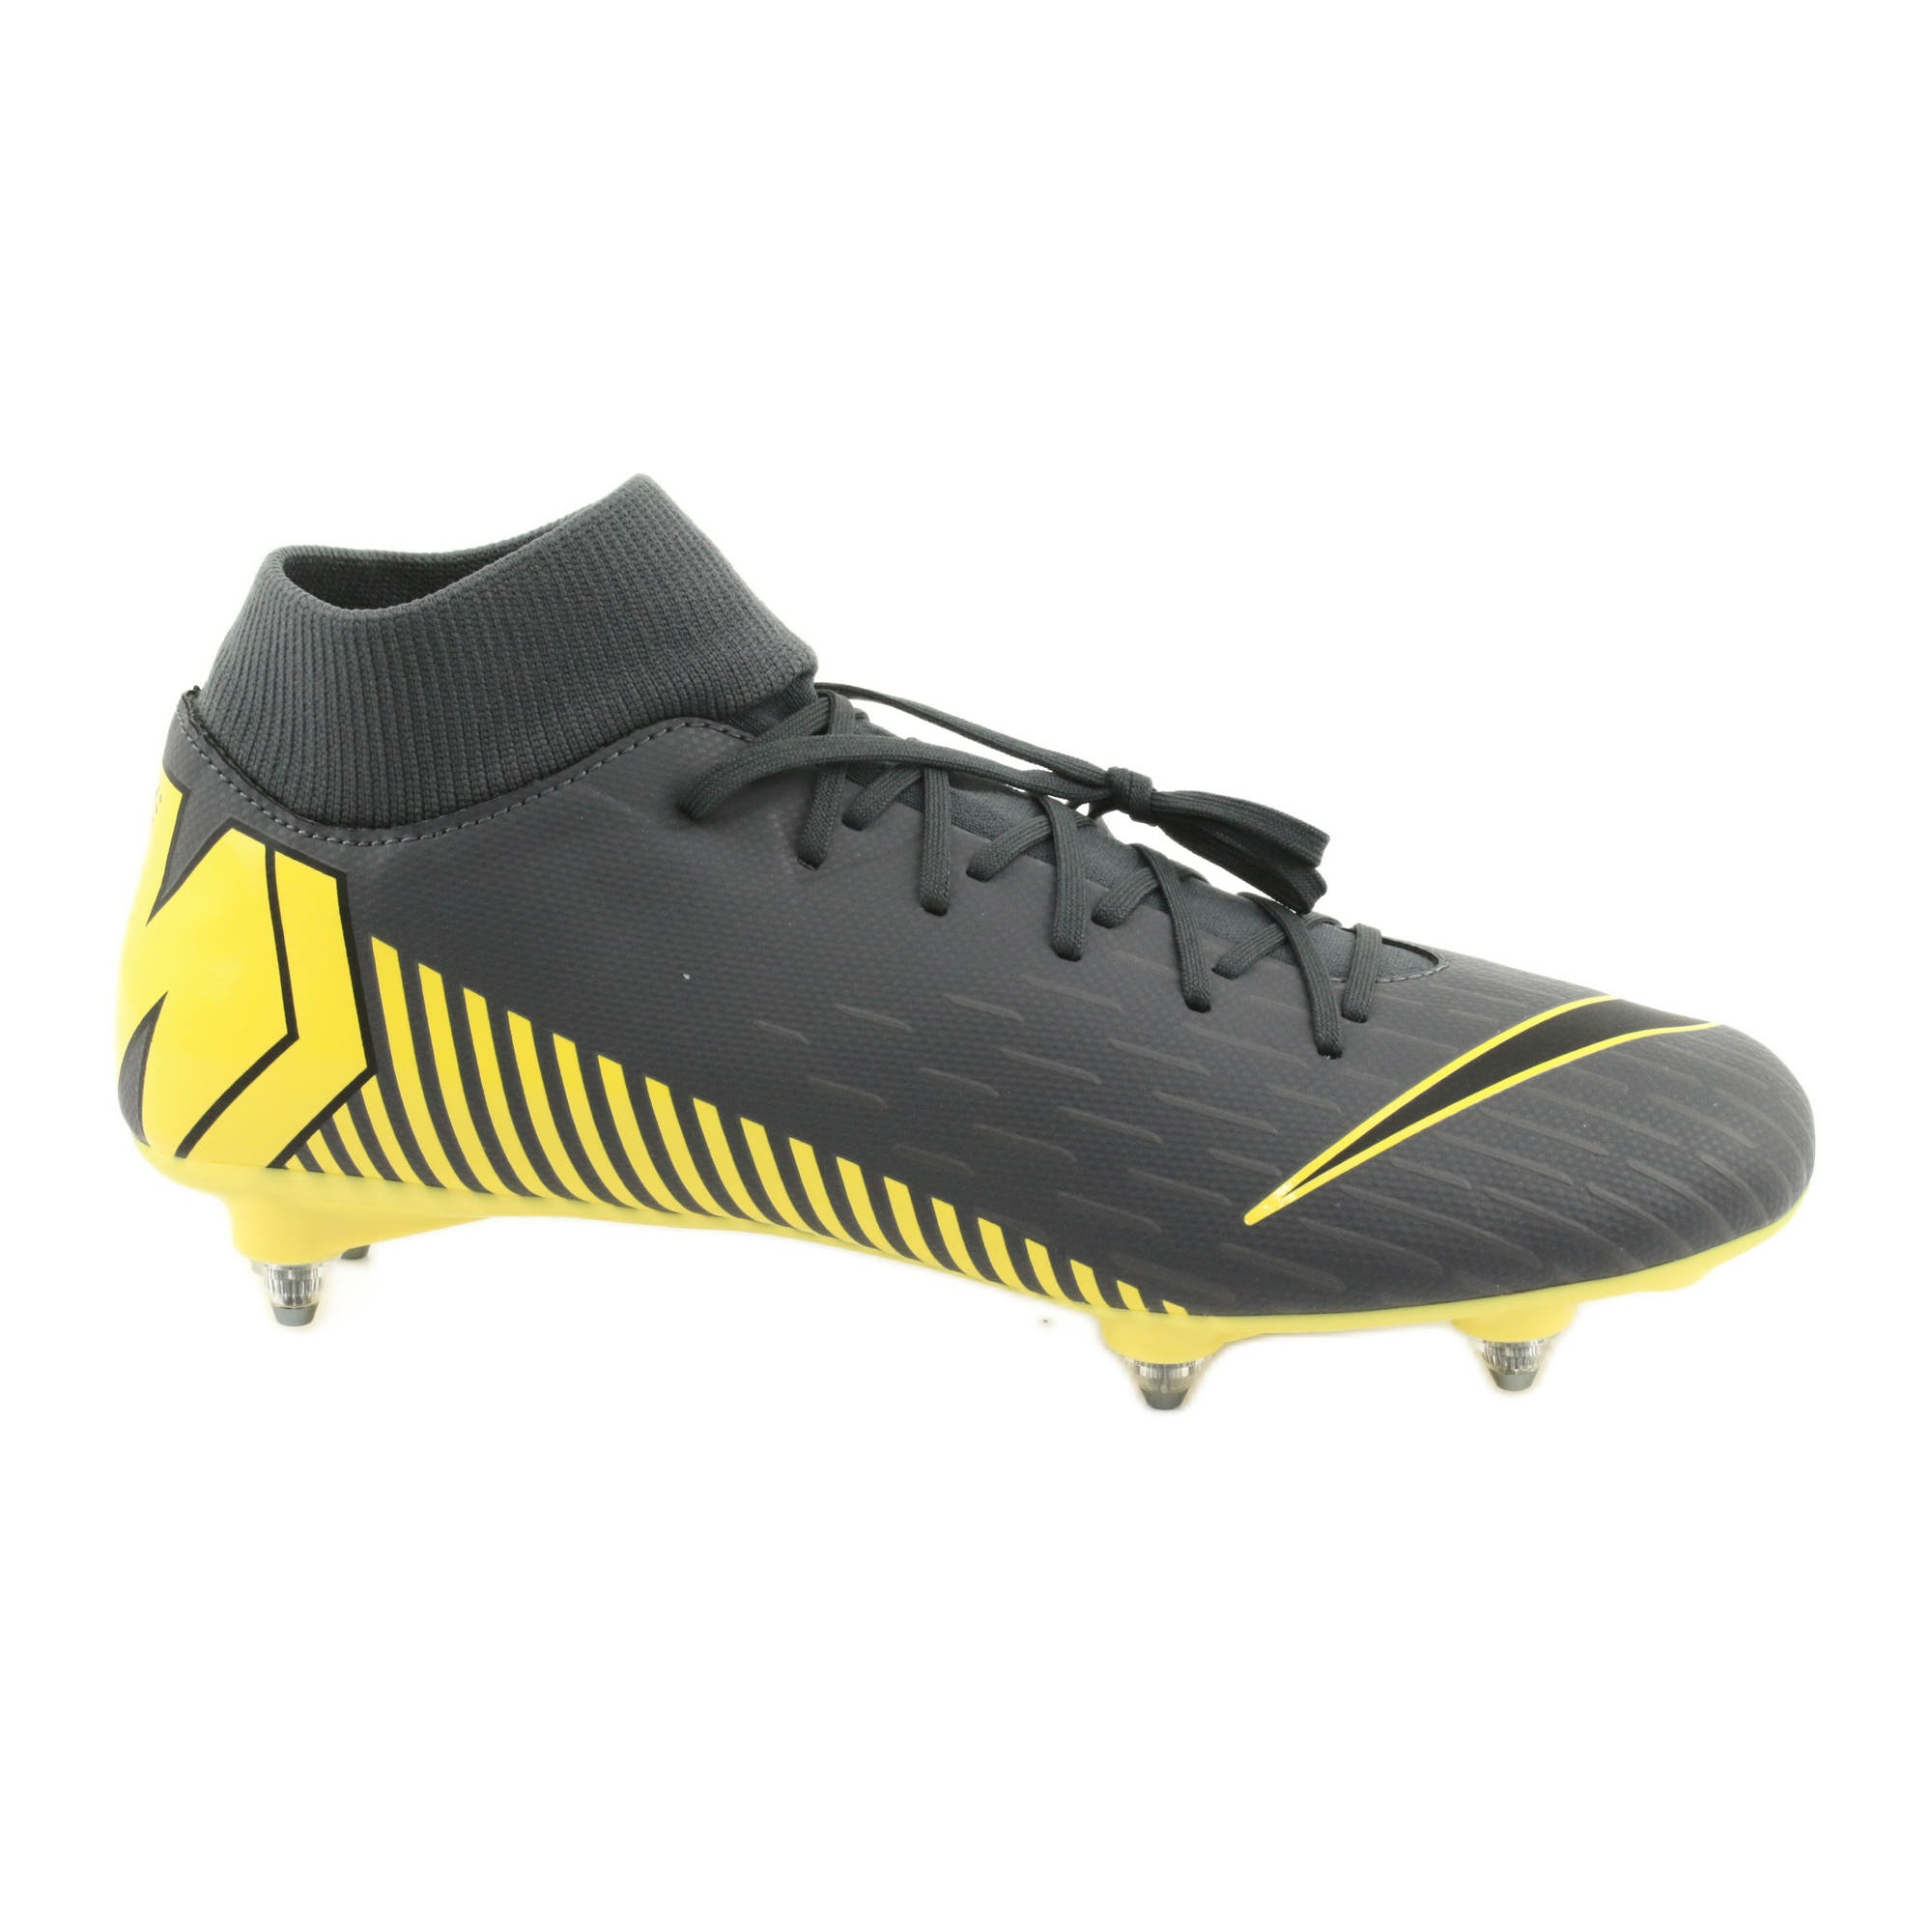 Nike Mercurial Superfly Academy 070 M Ah7364 Fußballschuhe 6